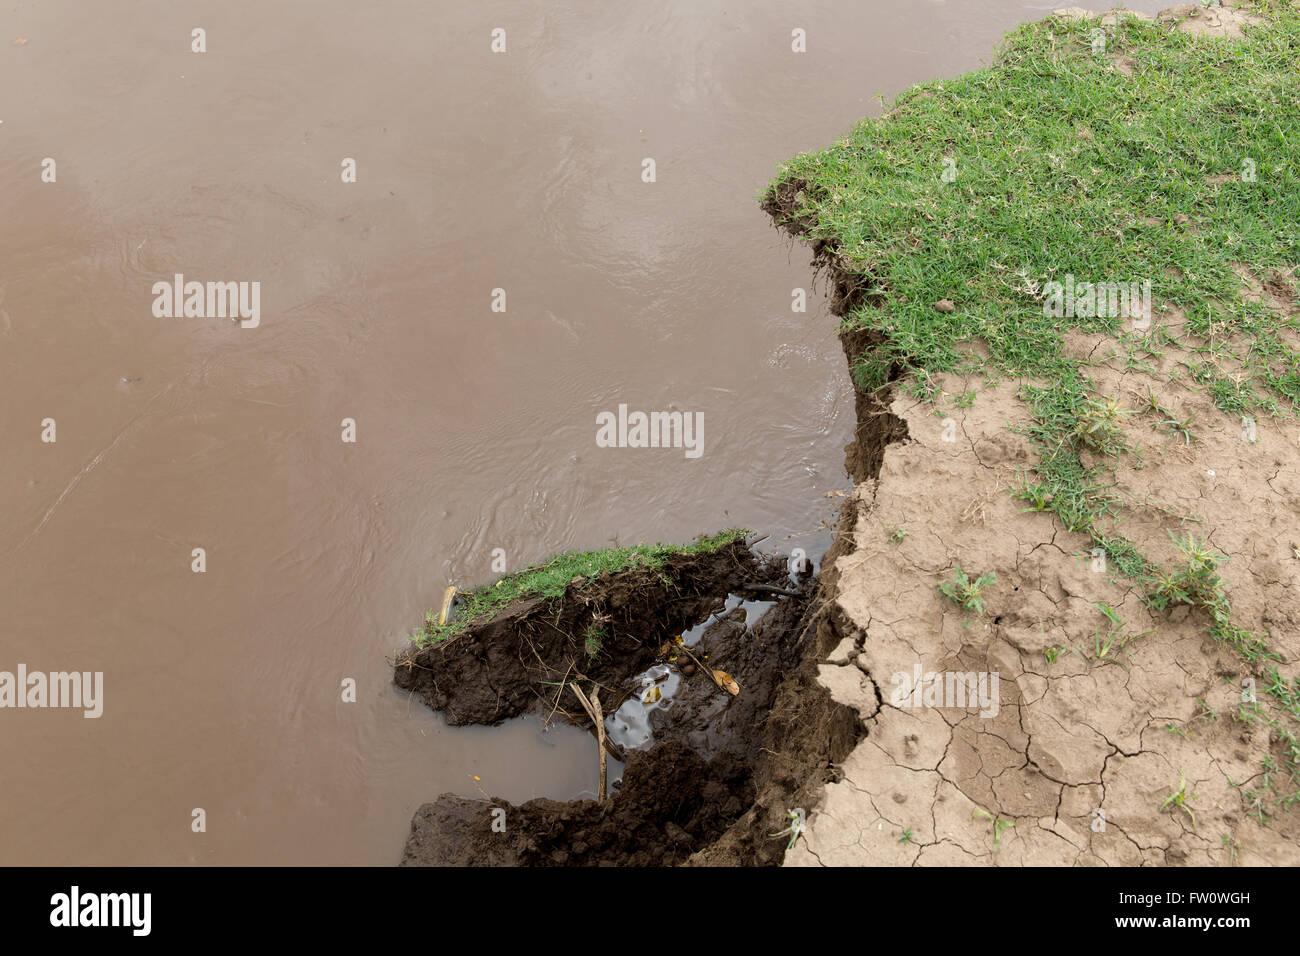 Meki River Delta, Ethiopia, October 2013 River erosion due to poor watershed management upstream. - Stock Image